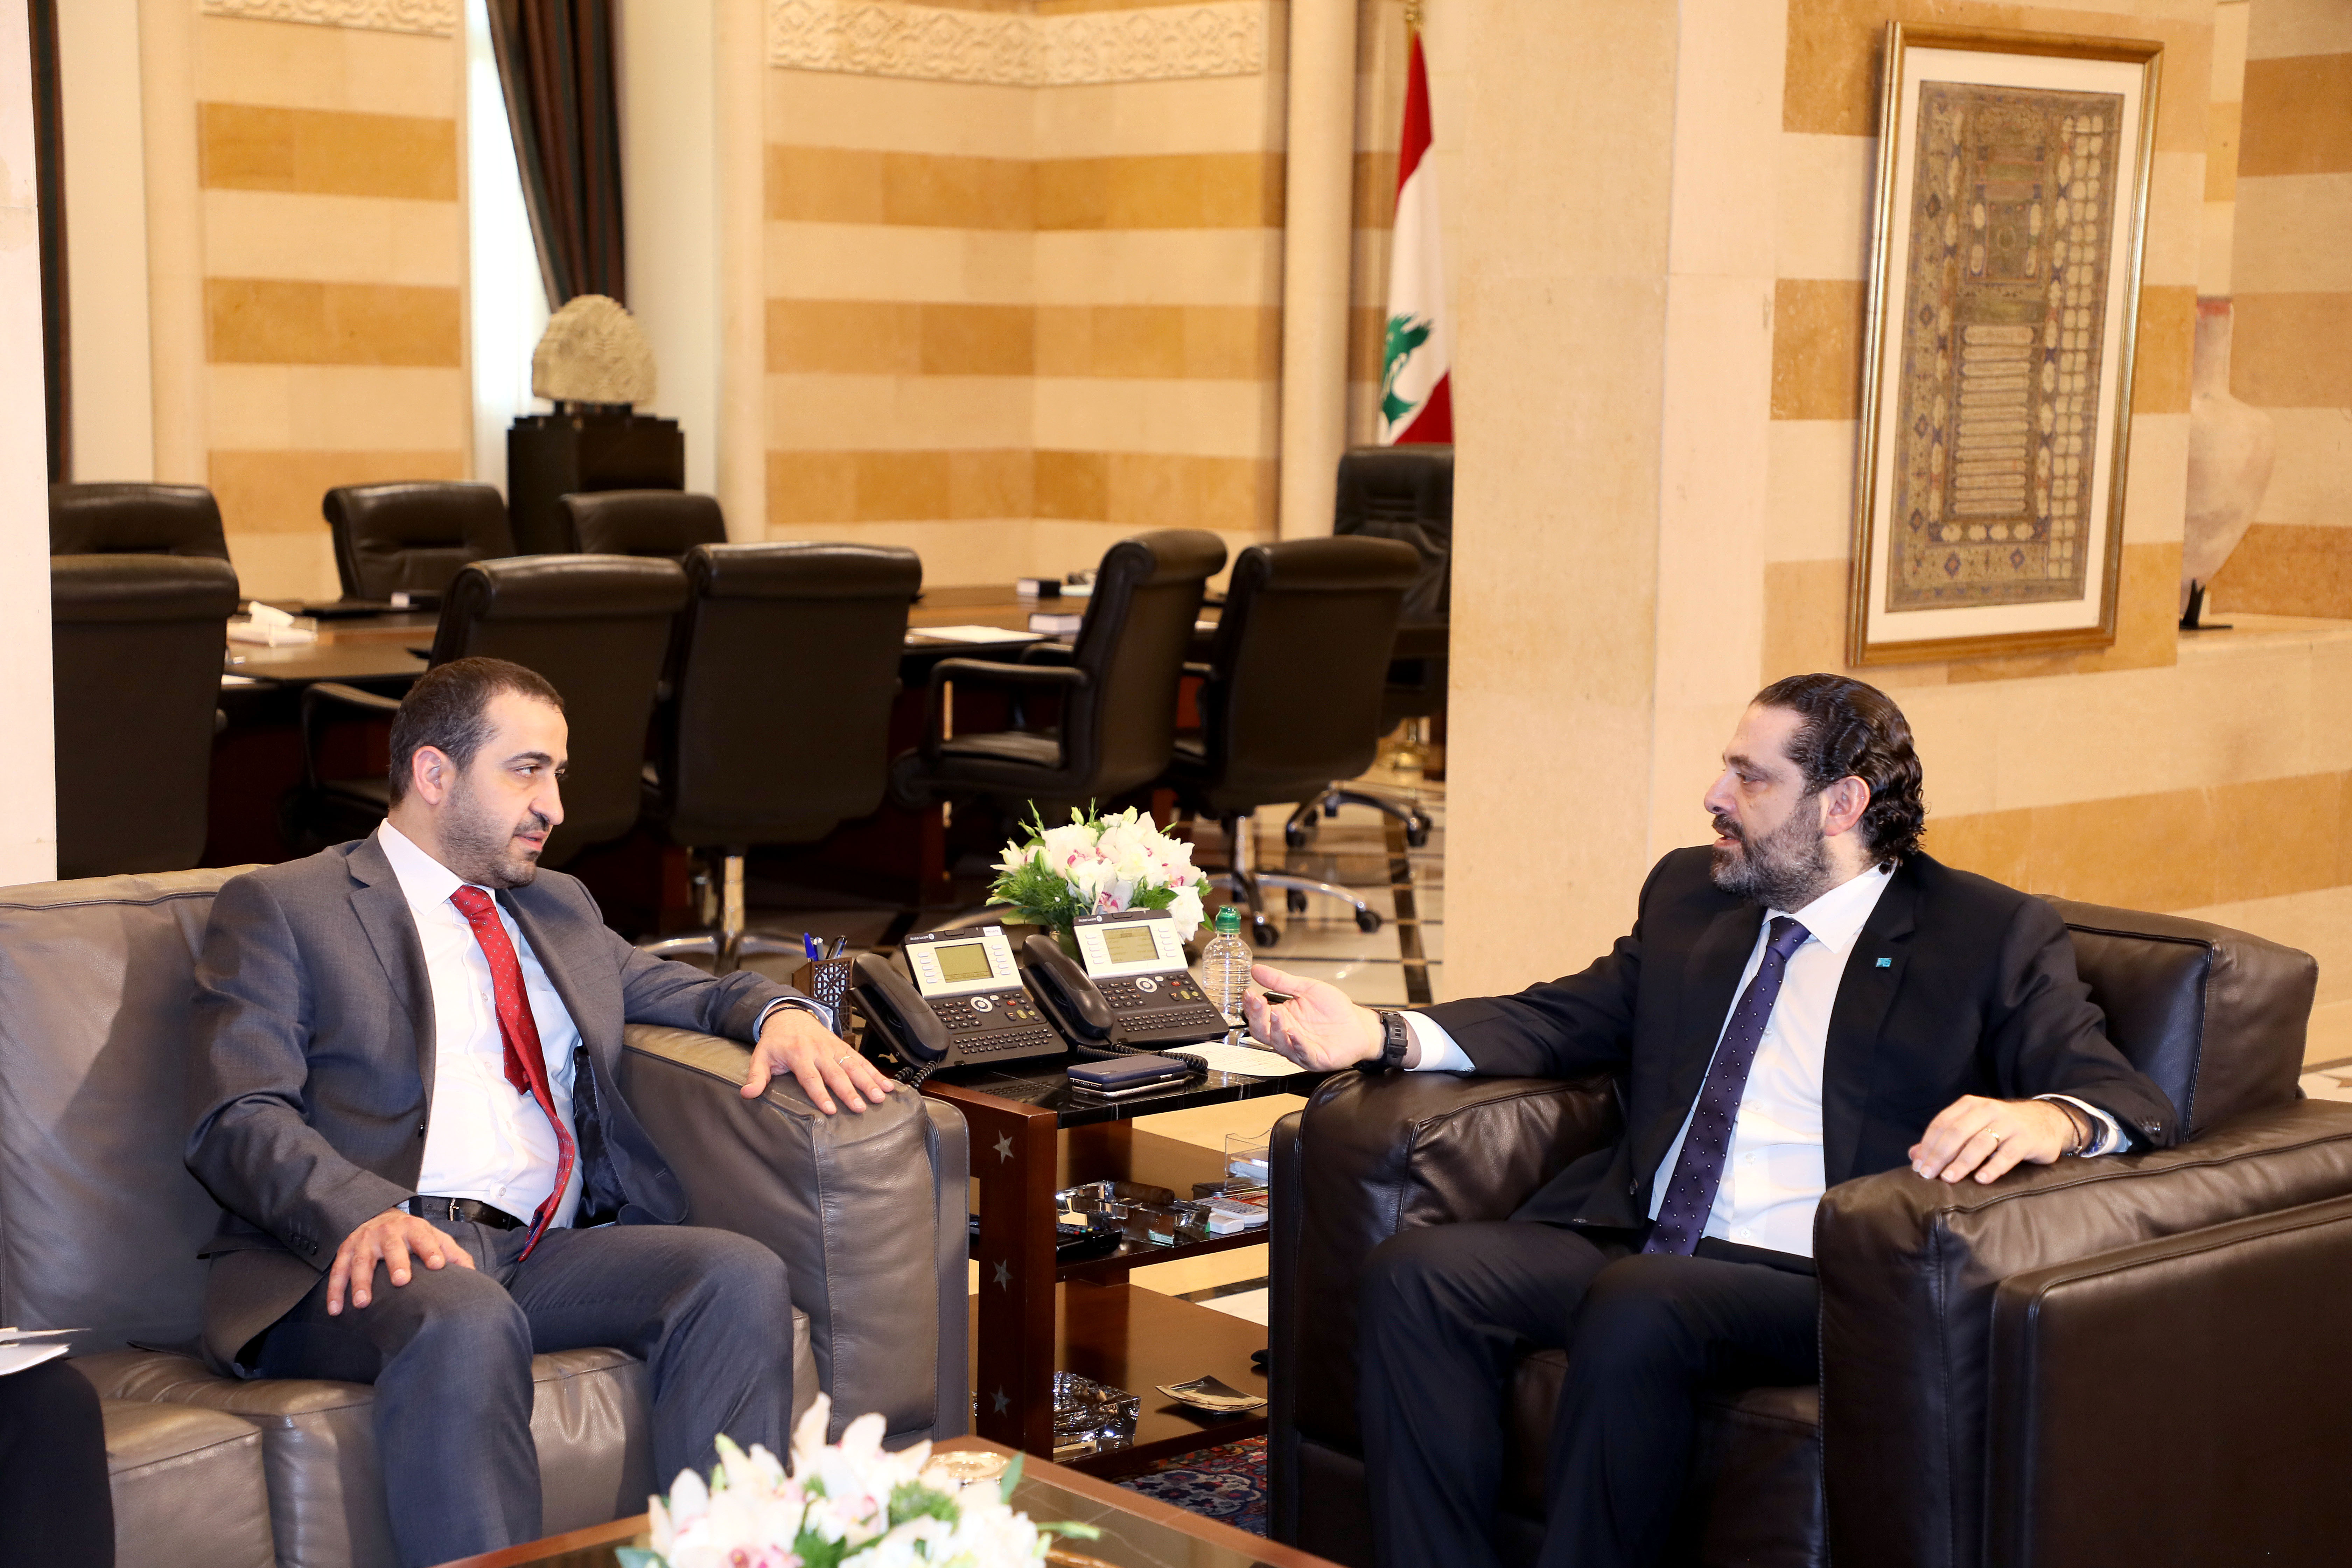 Pr Minister Saad Hariri meets Minister Ghassan Attalah